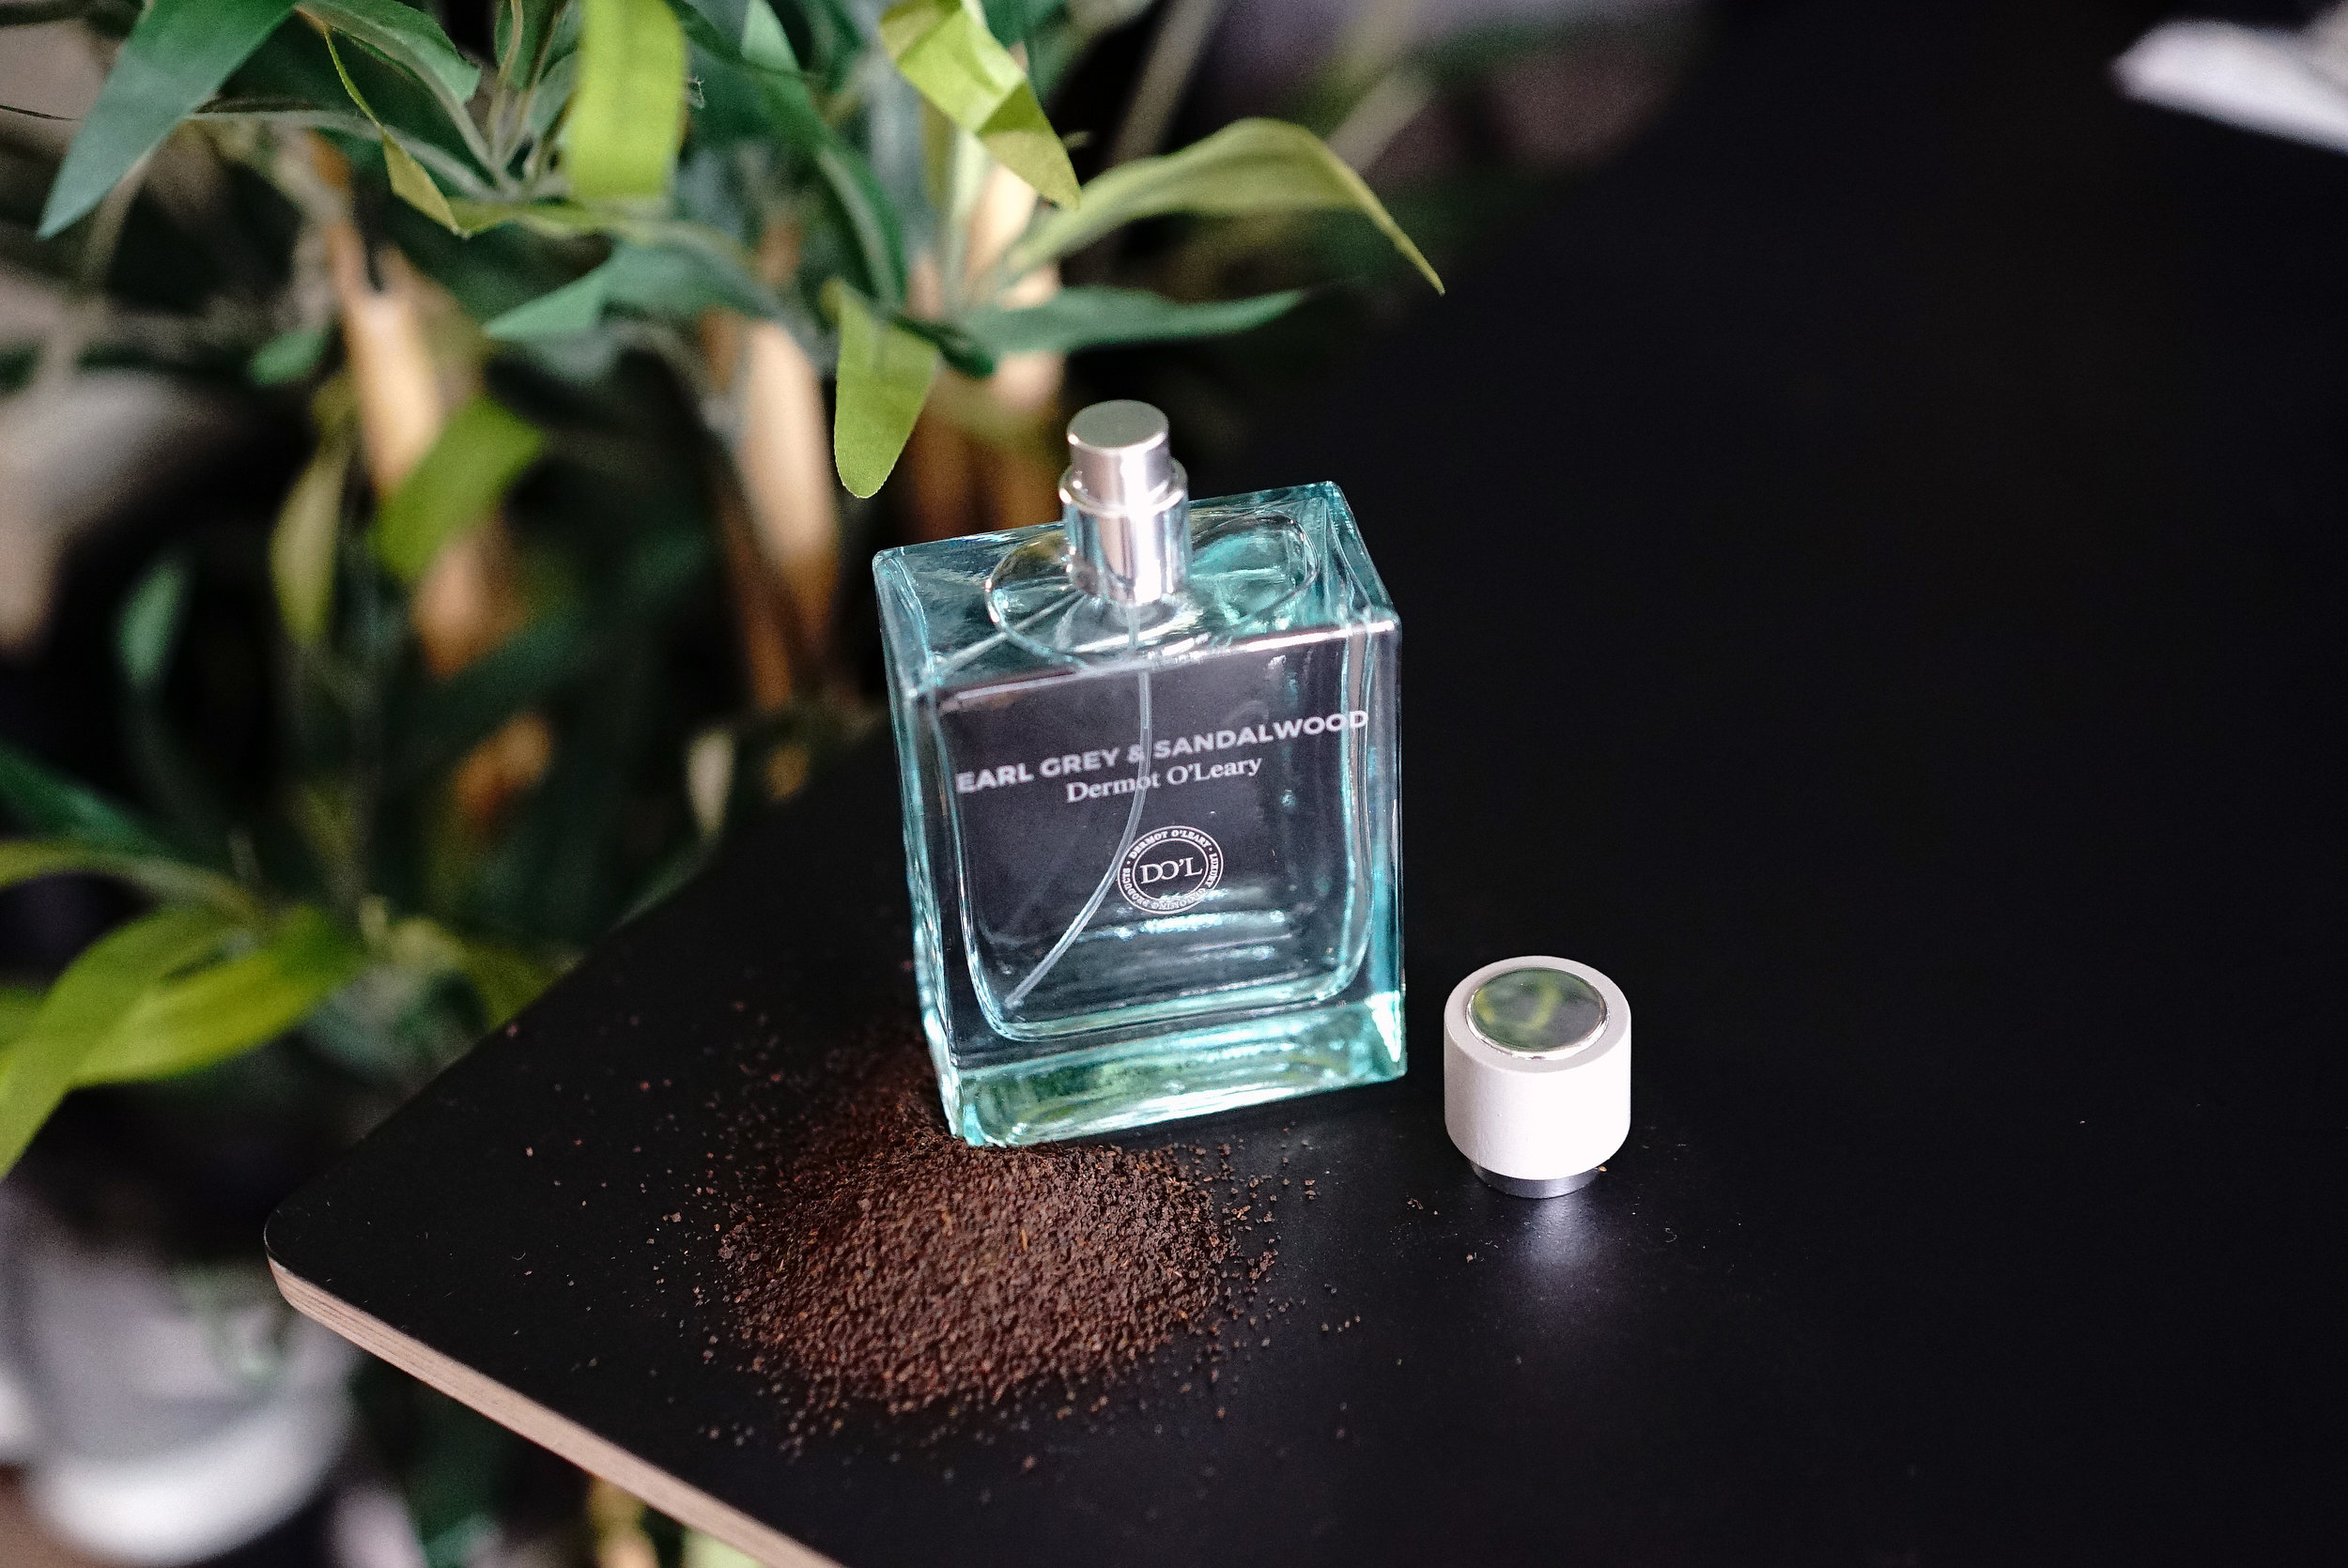 Dermot OLeary Earl Grey & Sandalwood Fragrance 2.jpg